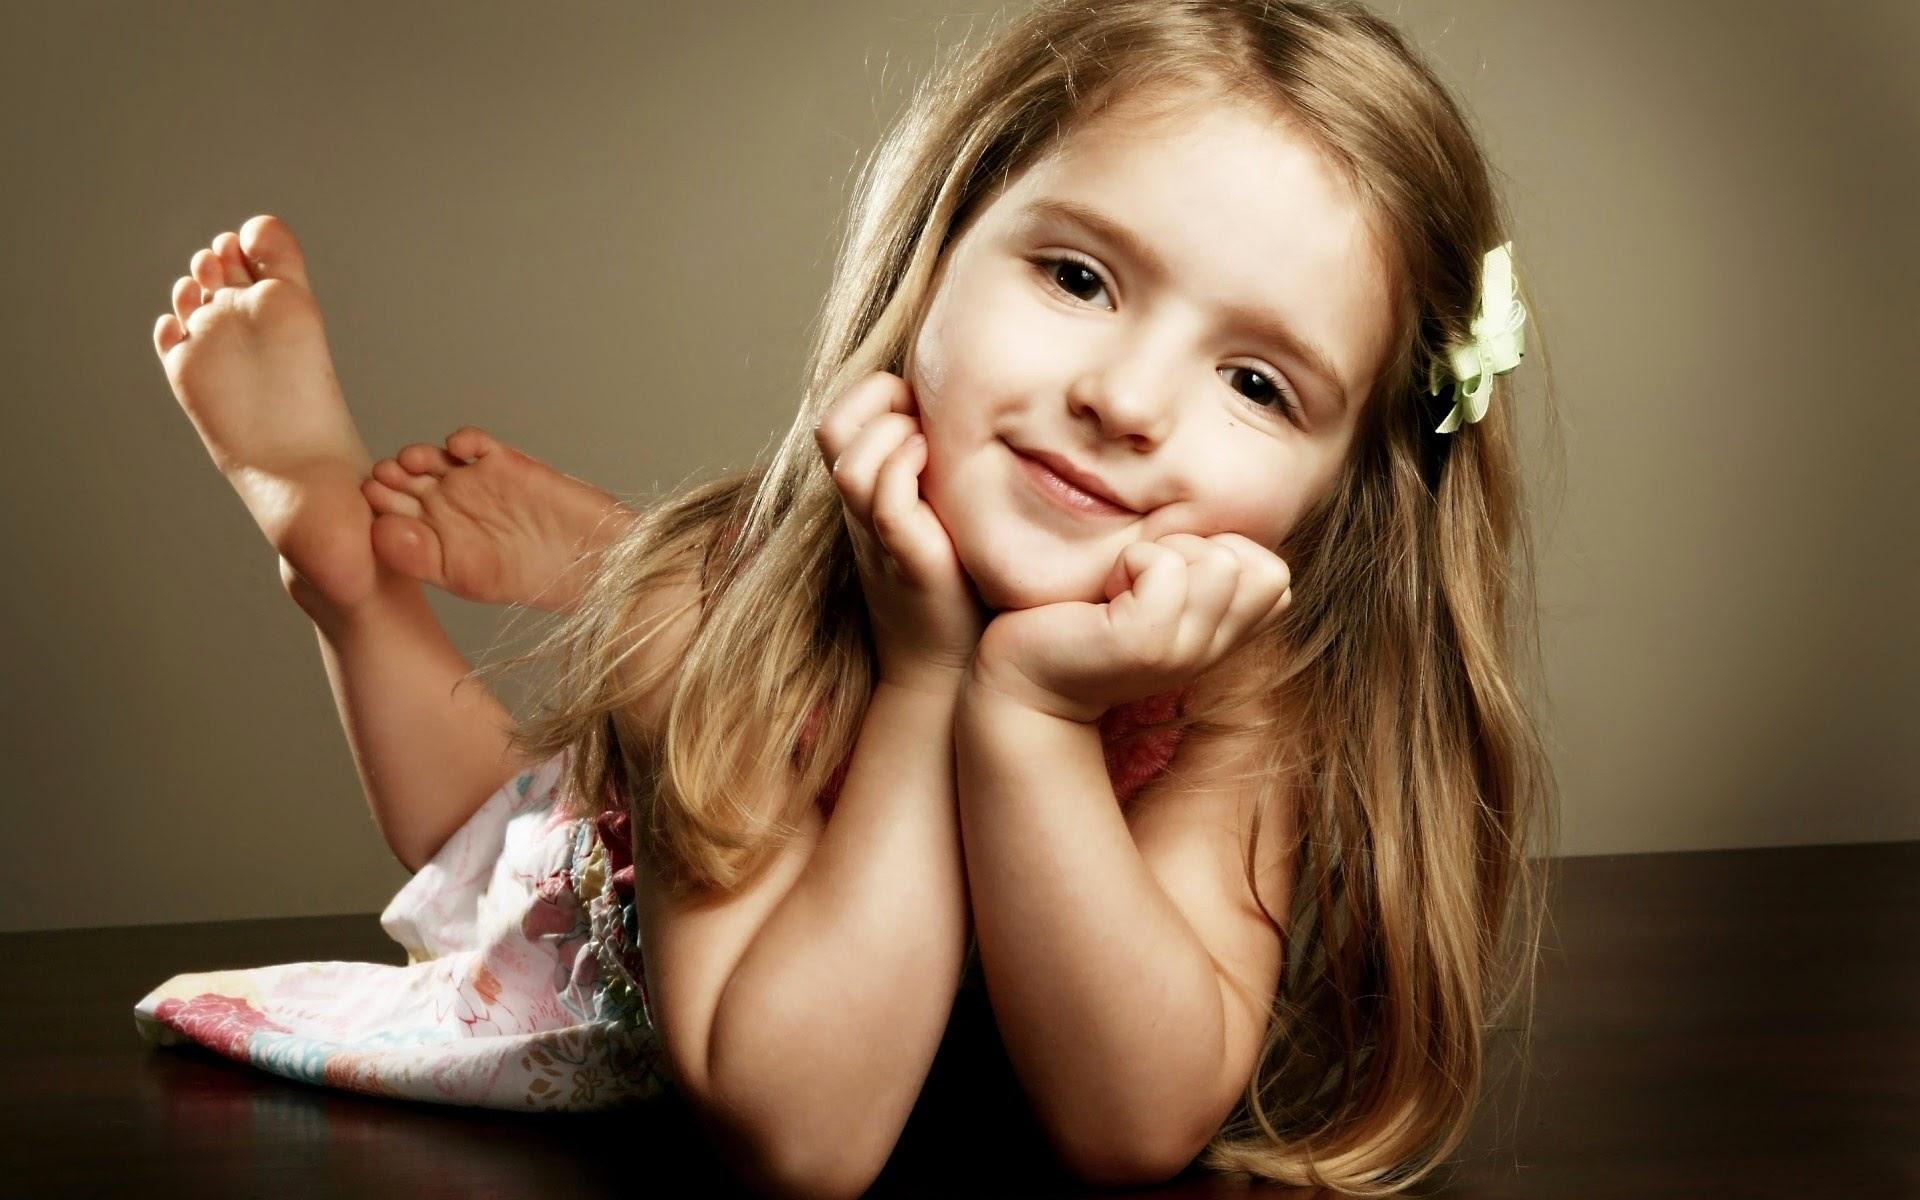 Beautiful Baby Girl Profile Pics For DP